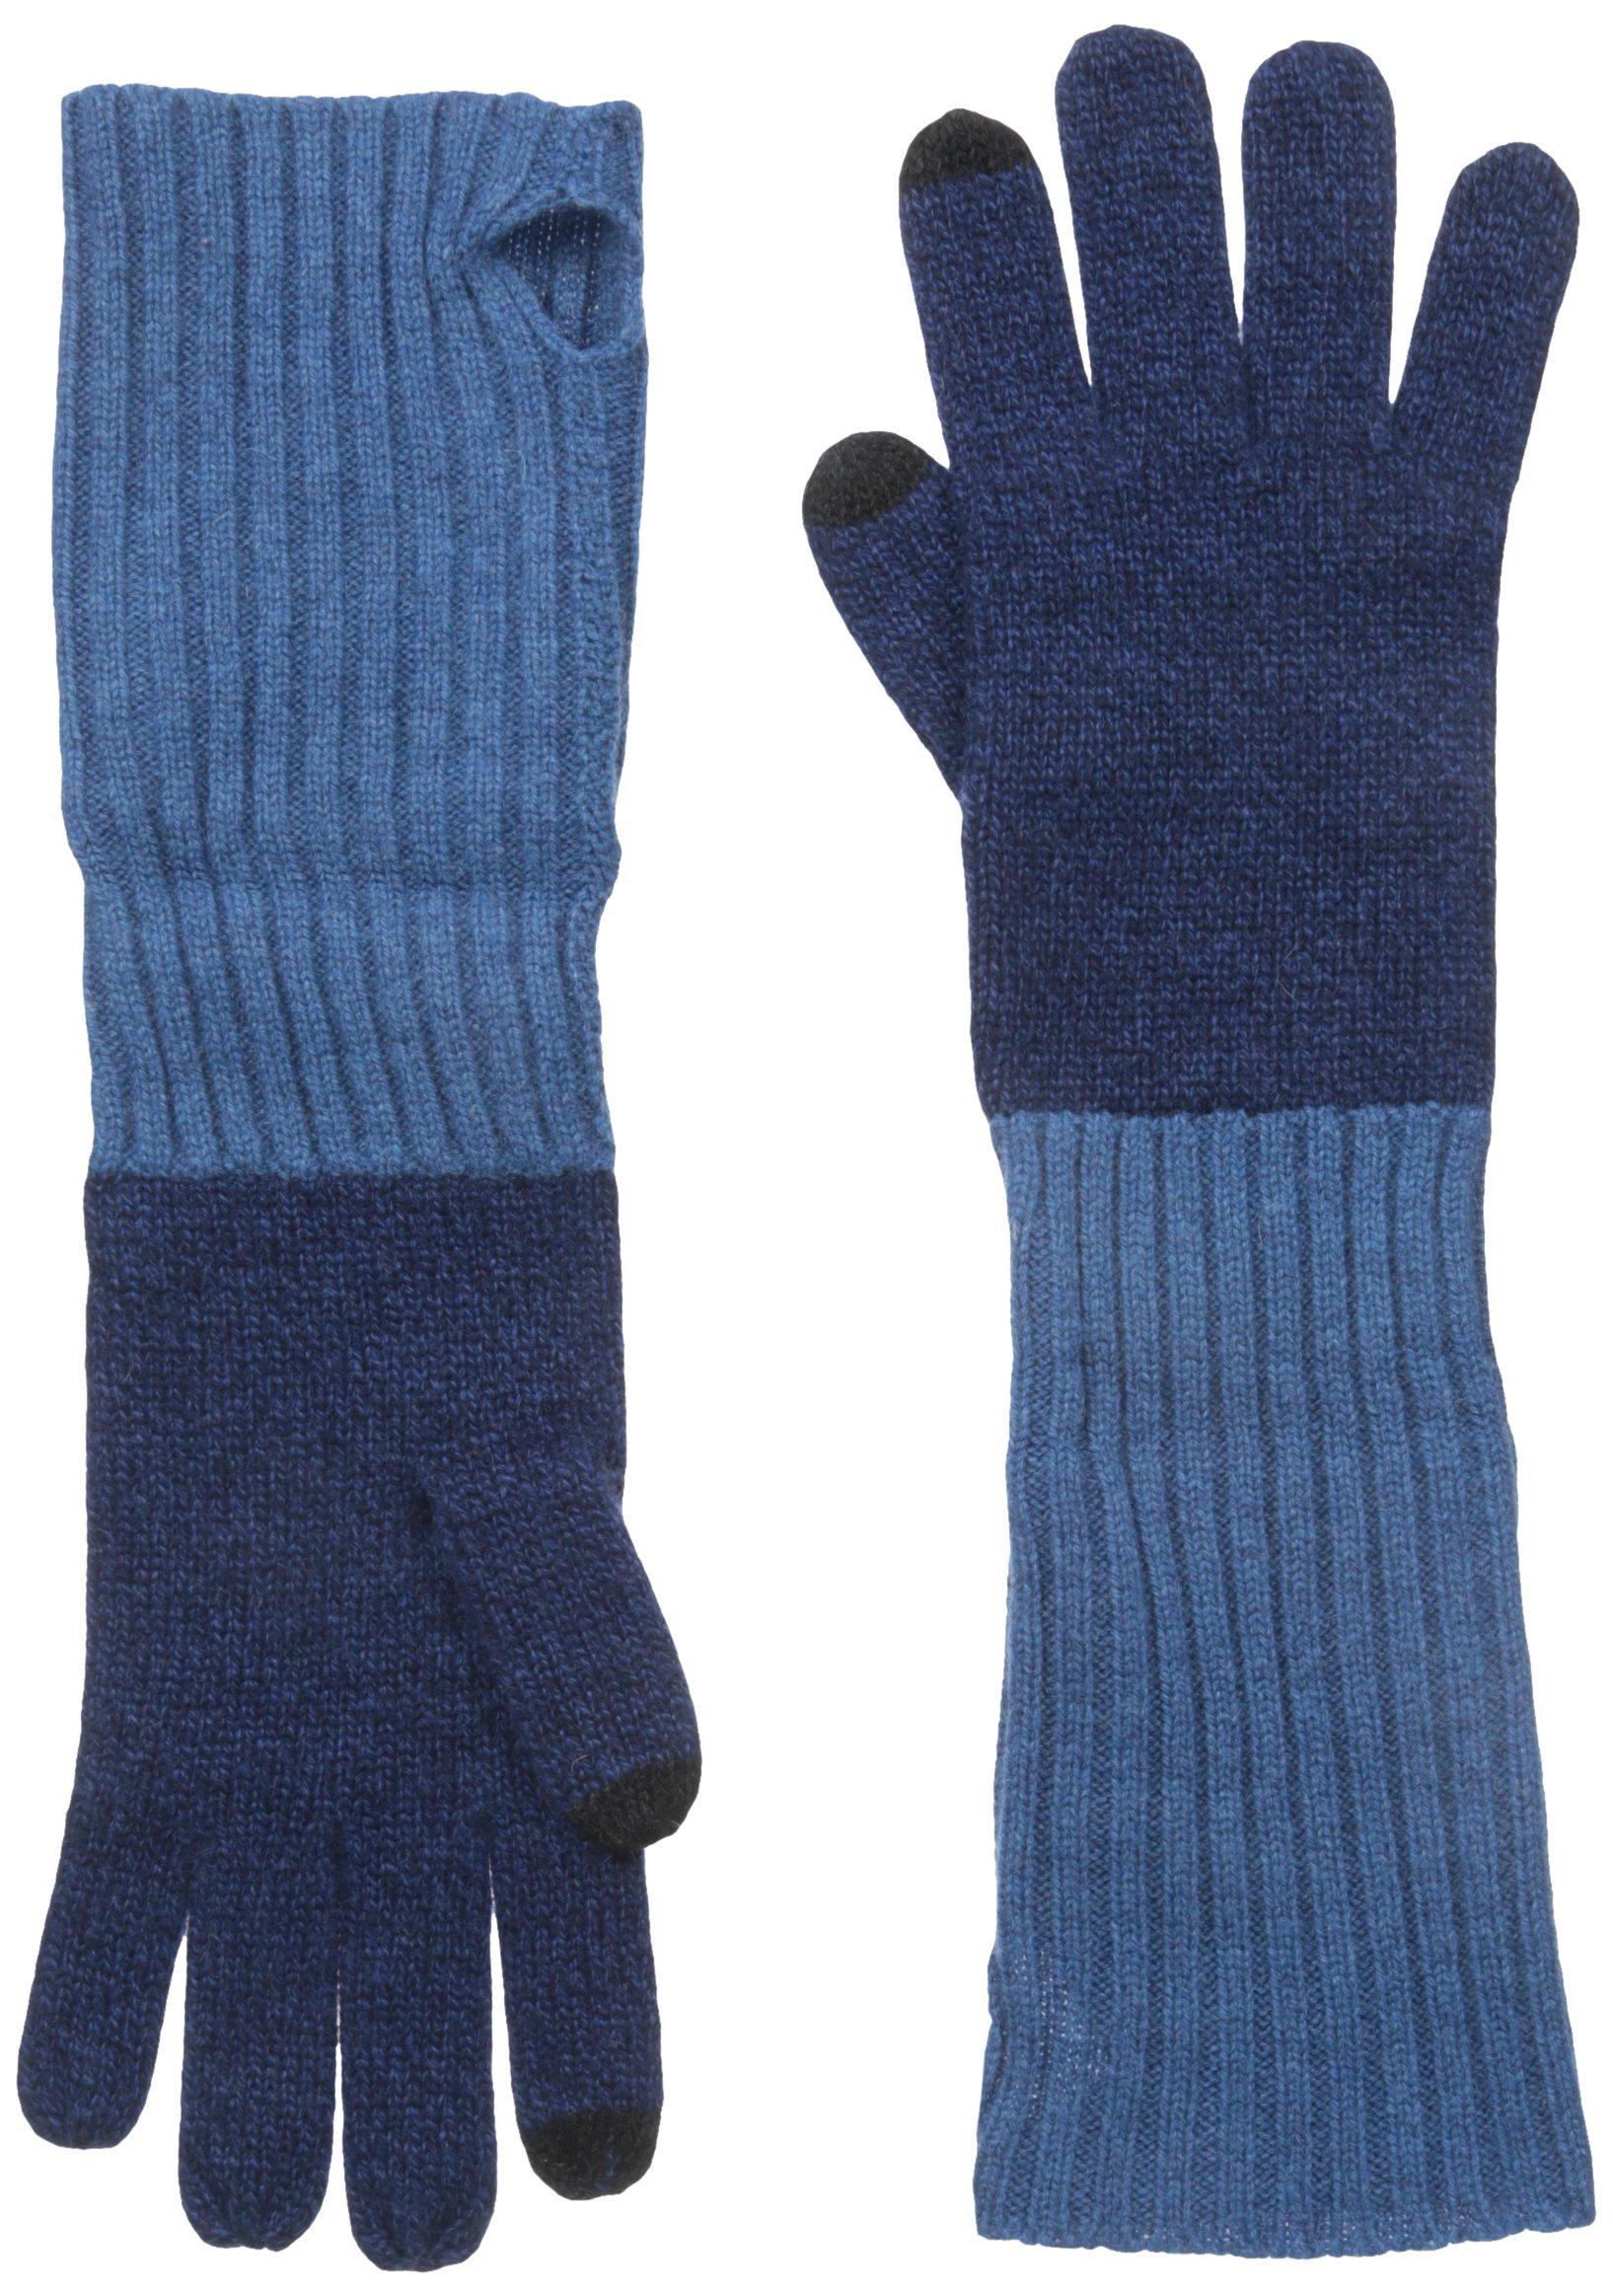 Phenix Cashmere Women's 100 Percent Cashmere Knit Touch Tech Glove, Navy/Teal, One Size